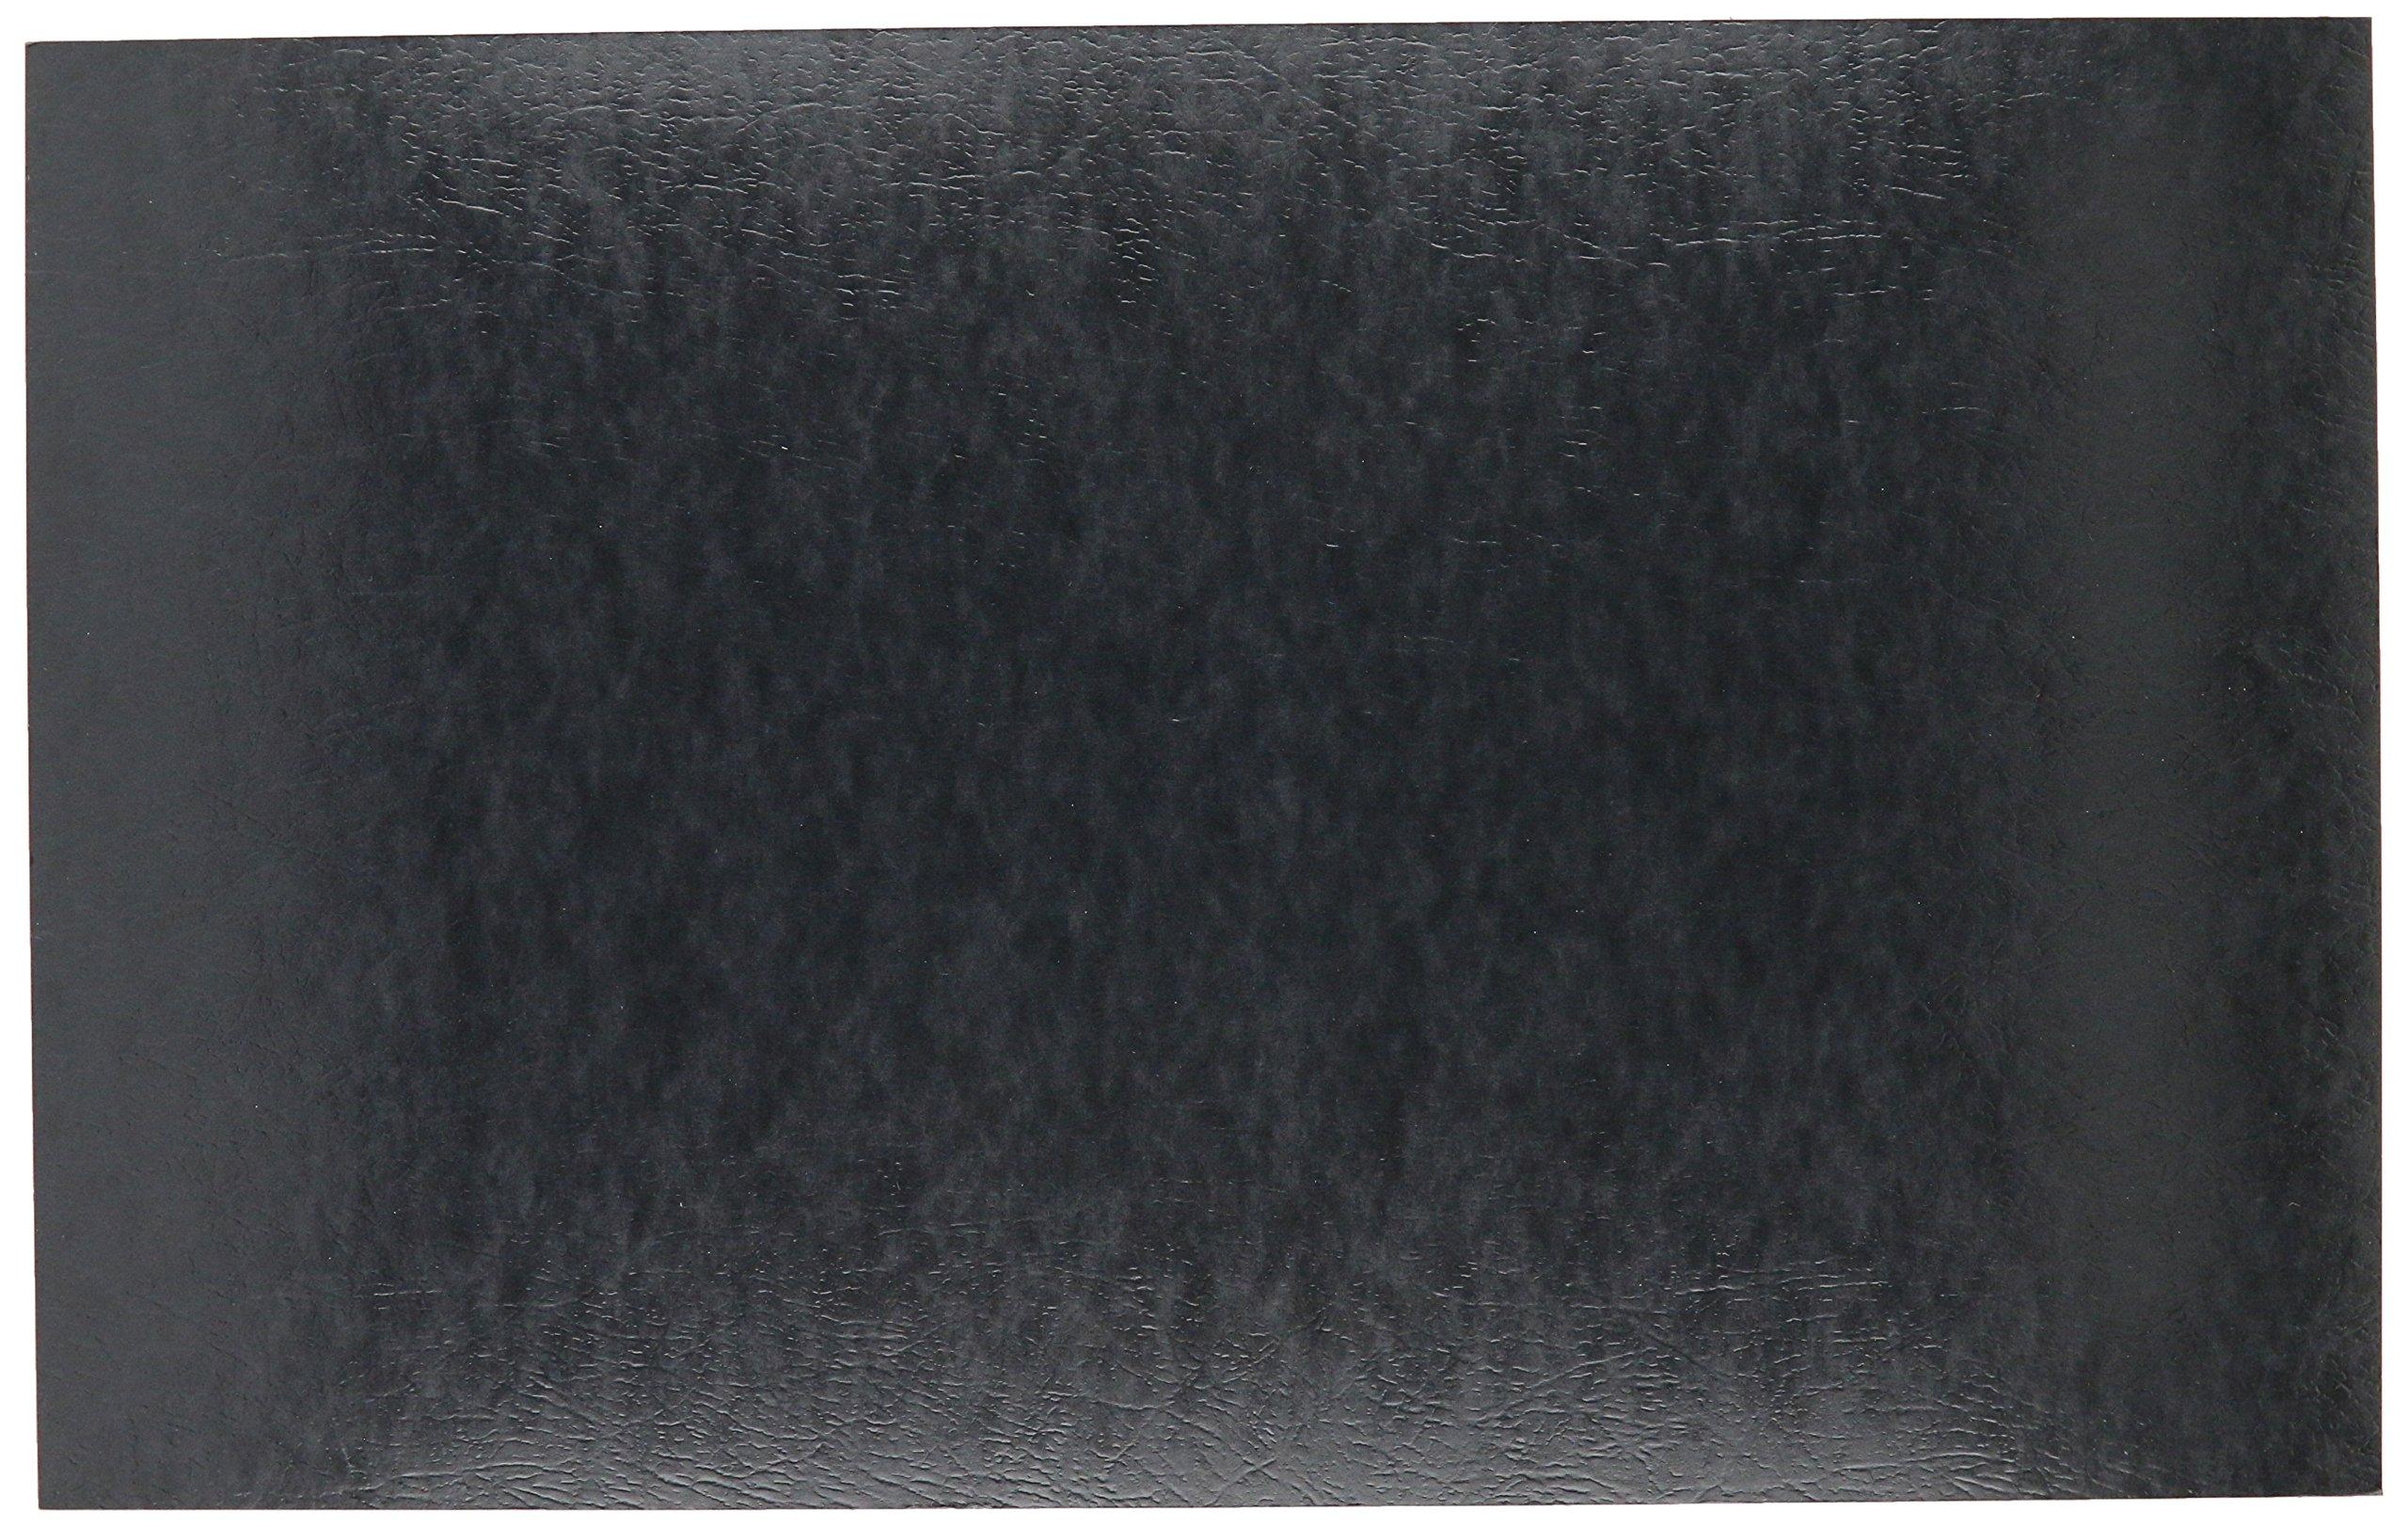 11x17 Presentation Covers - Fiberboard Pressboard (Black)